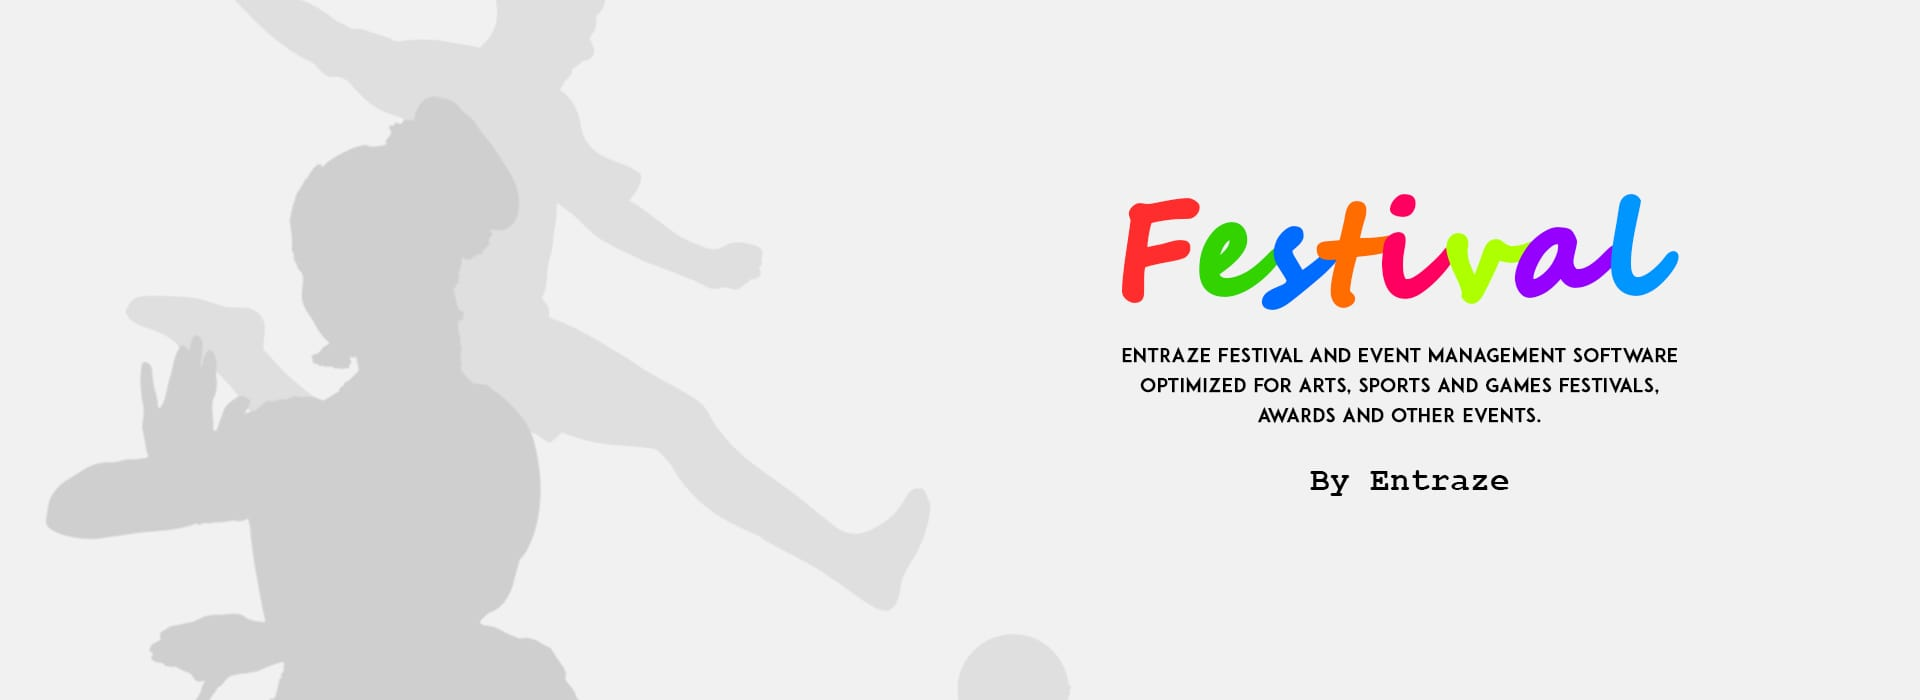 Entraze Festival